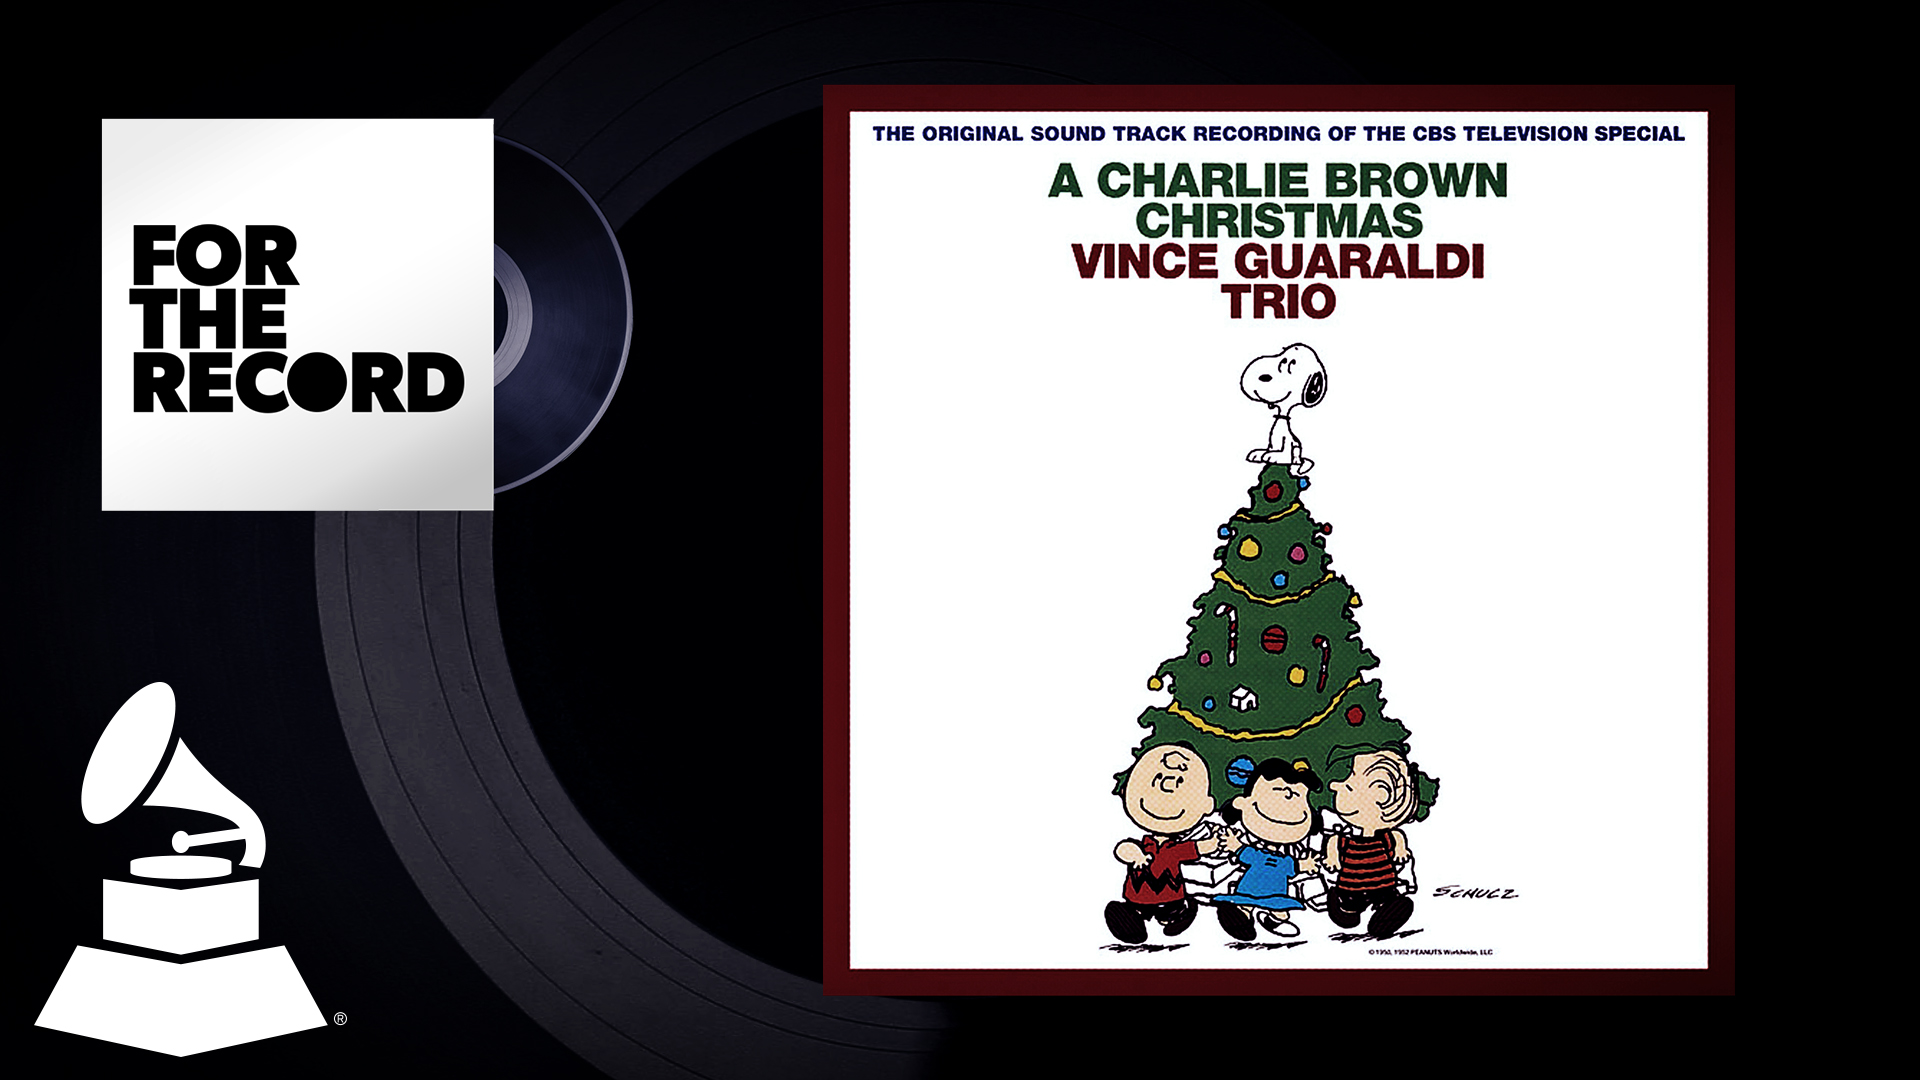 Vince Guaraldi Trio A Charlie Brown Christmas - HD Wallpaper